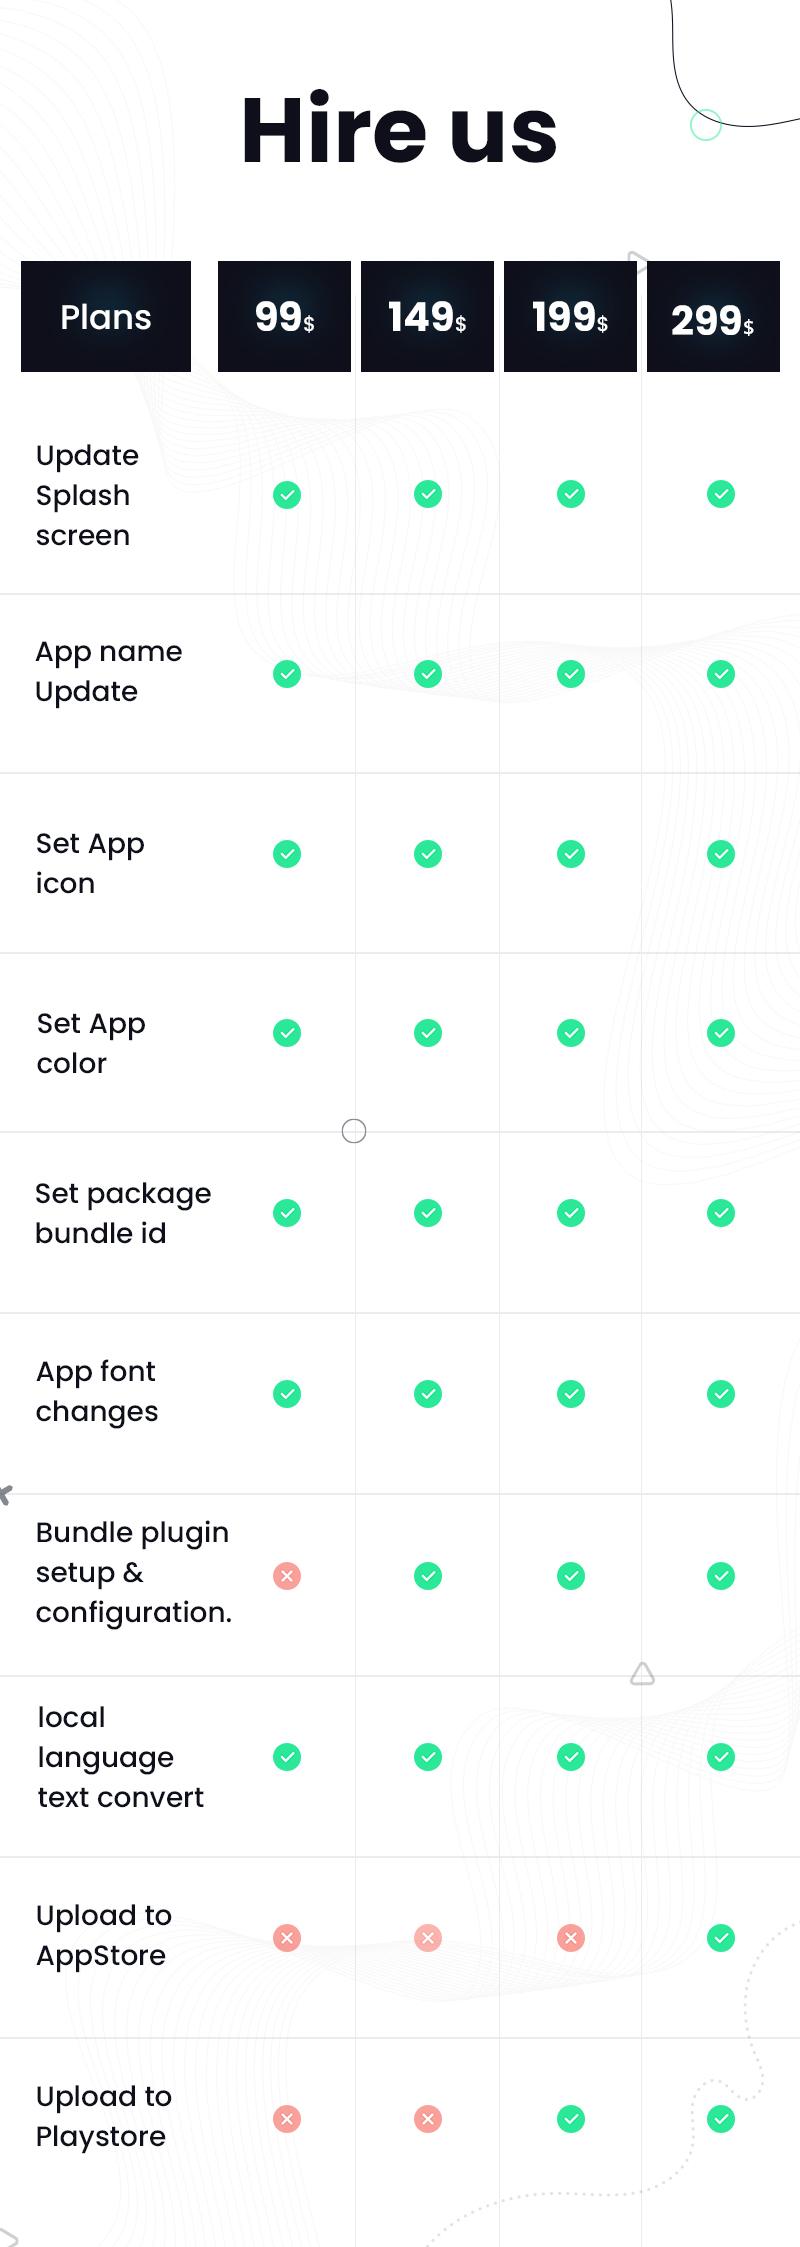 Best online bootstore flutter app | Bookkart | Iqonic Design flutter ebook reader app for wordpress with woocommerce Bookkart PRICING TABLE